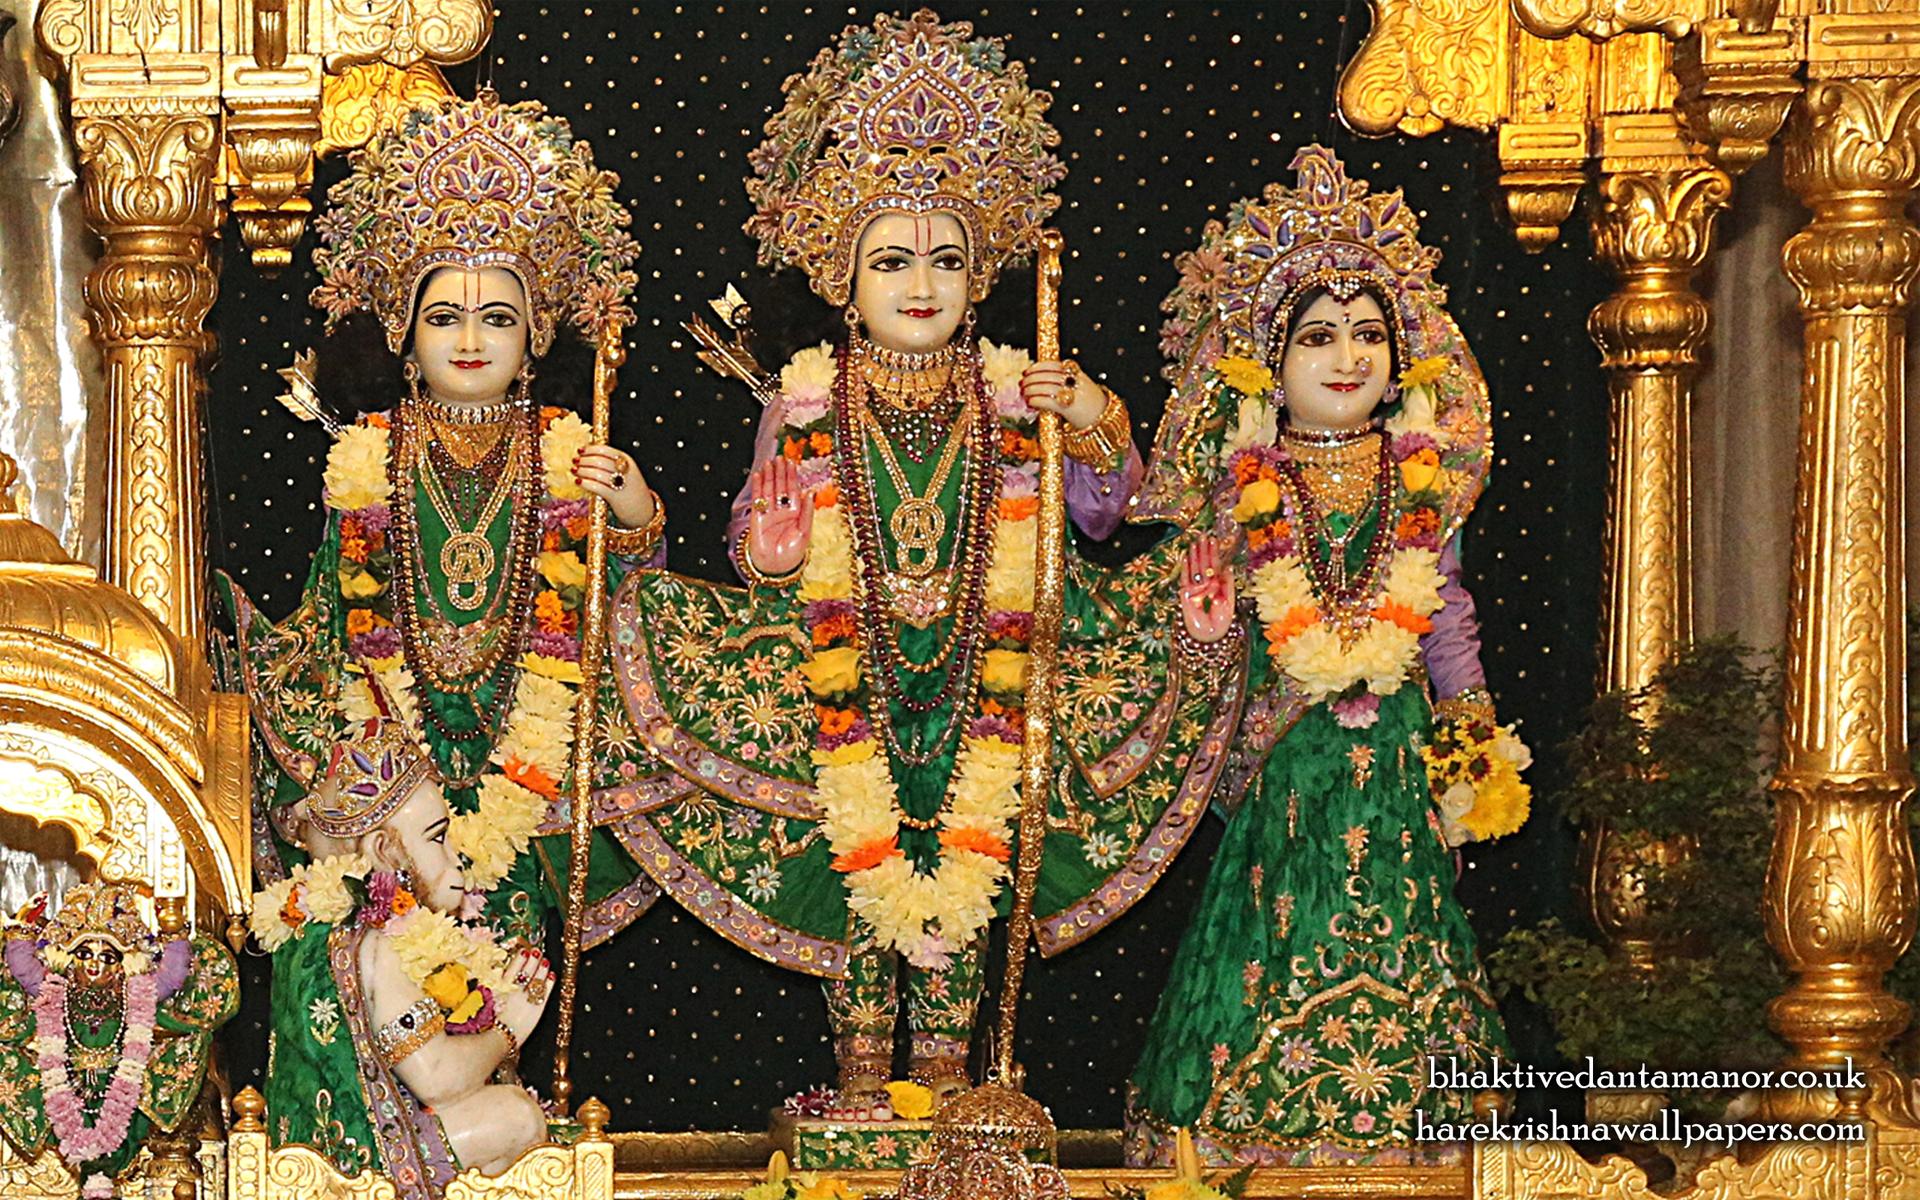 Sri Sri Sita Rama Laxman Hanuman Wallpaper (013) Size 1920x1200 Download